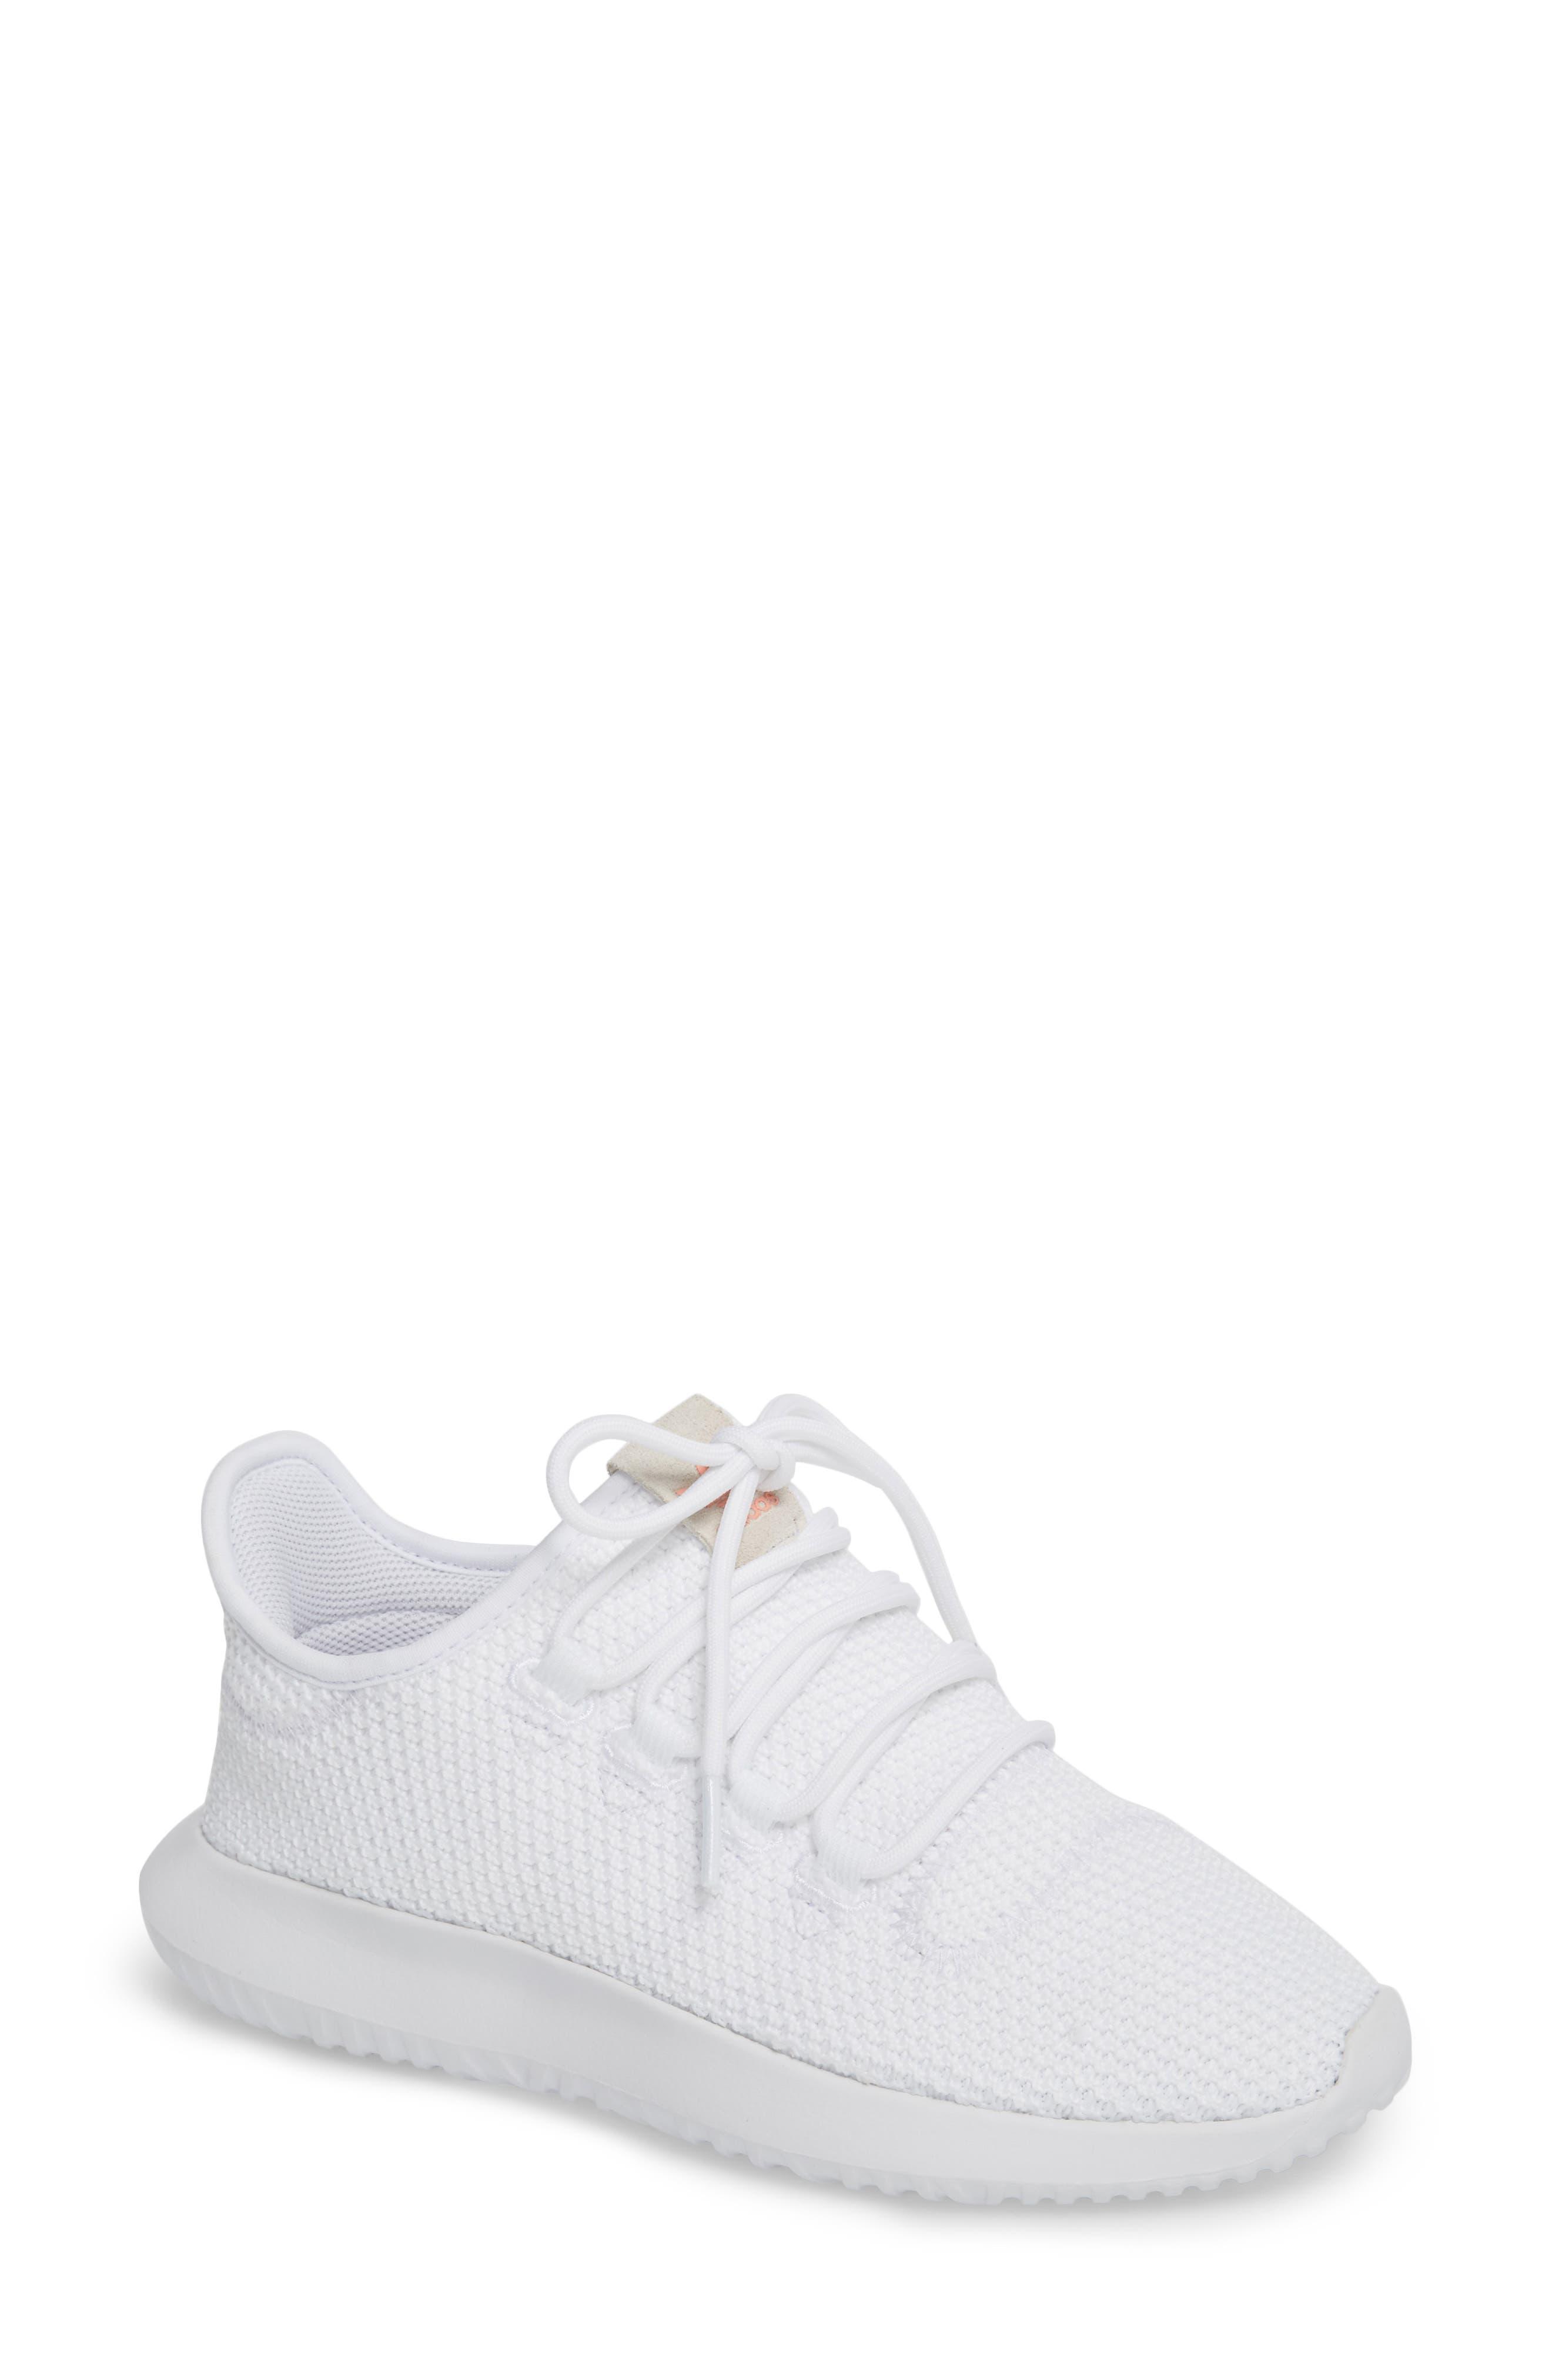 Tubular Shadow Sneaker,                             Main thumbnail 1, color,                             White/ White/ Core Black